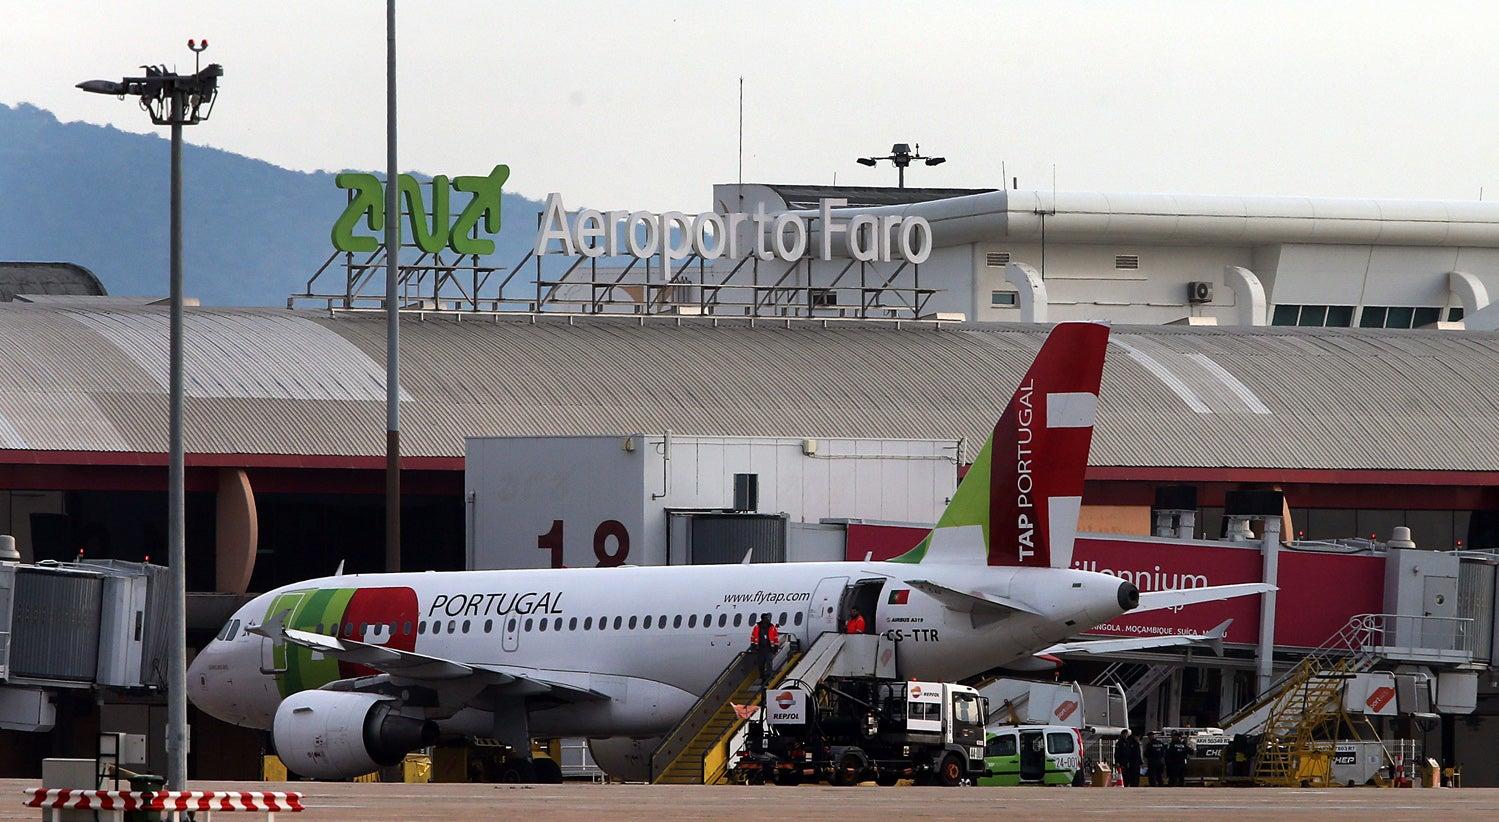 Amea�a de bomba em avi�o no aeroporto de Faro foi falso alarme